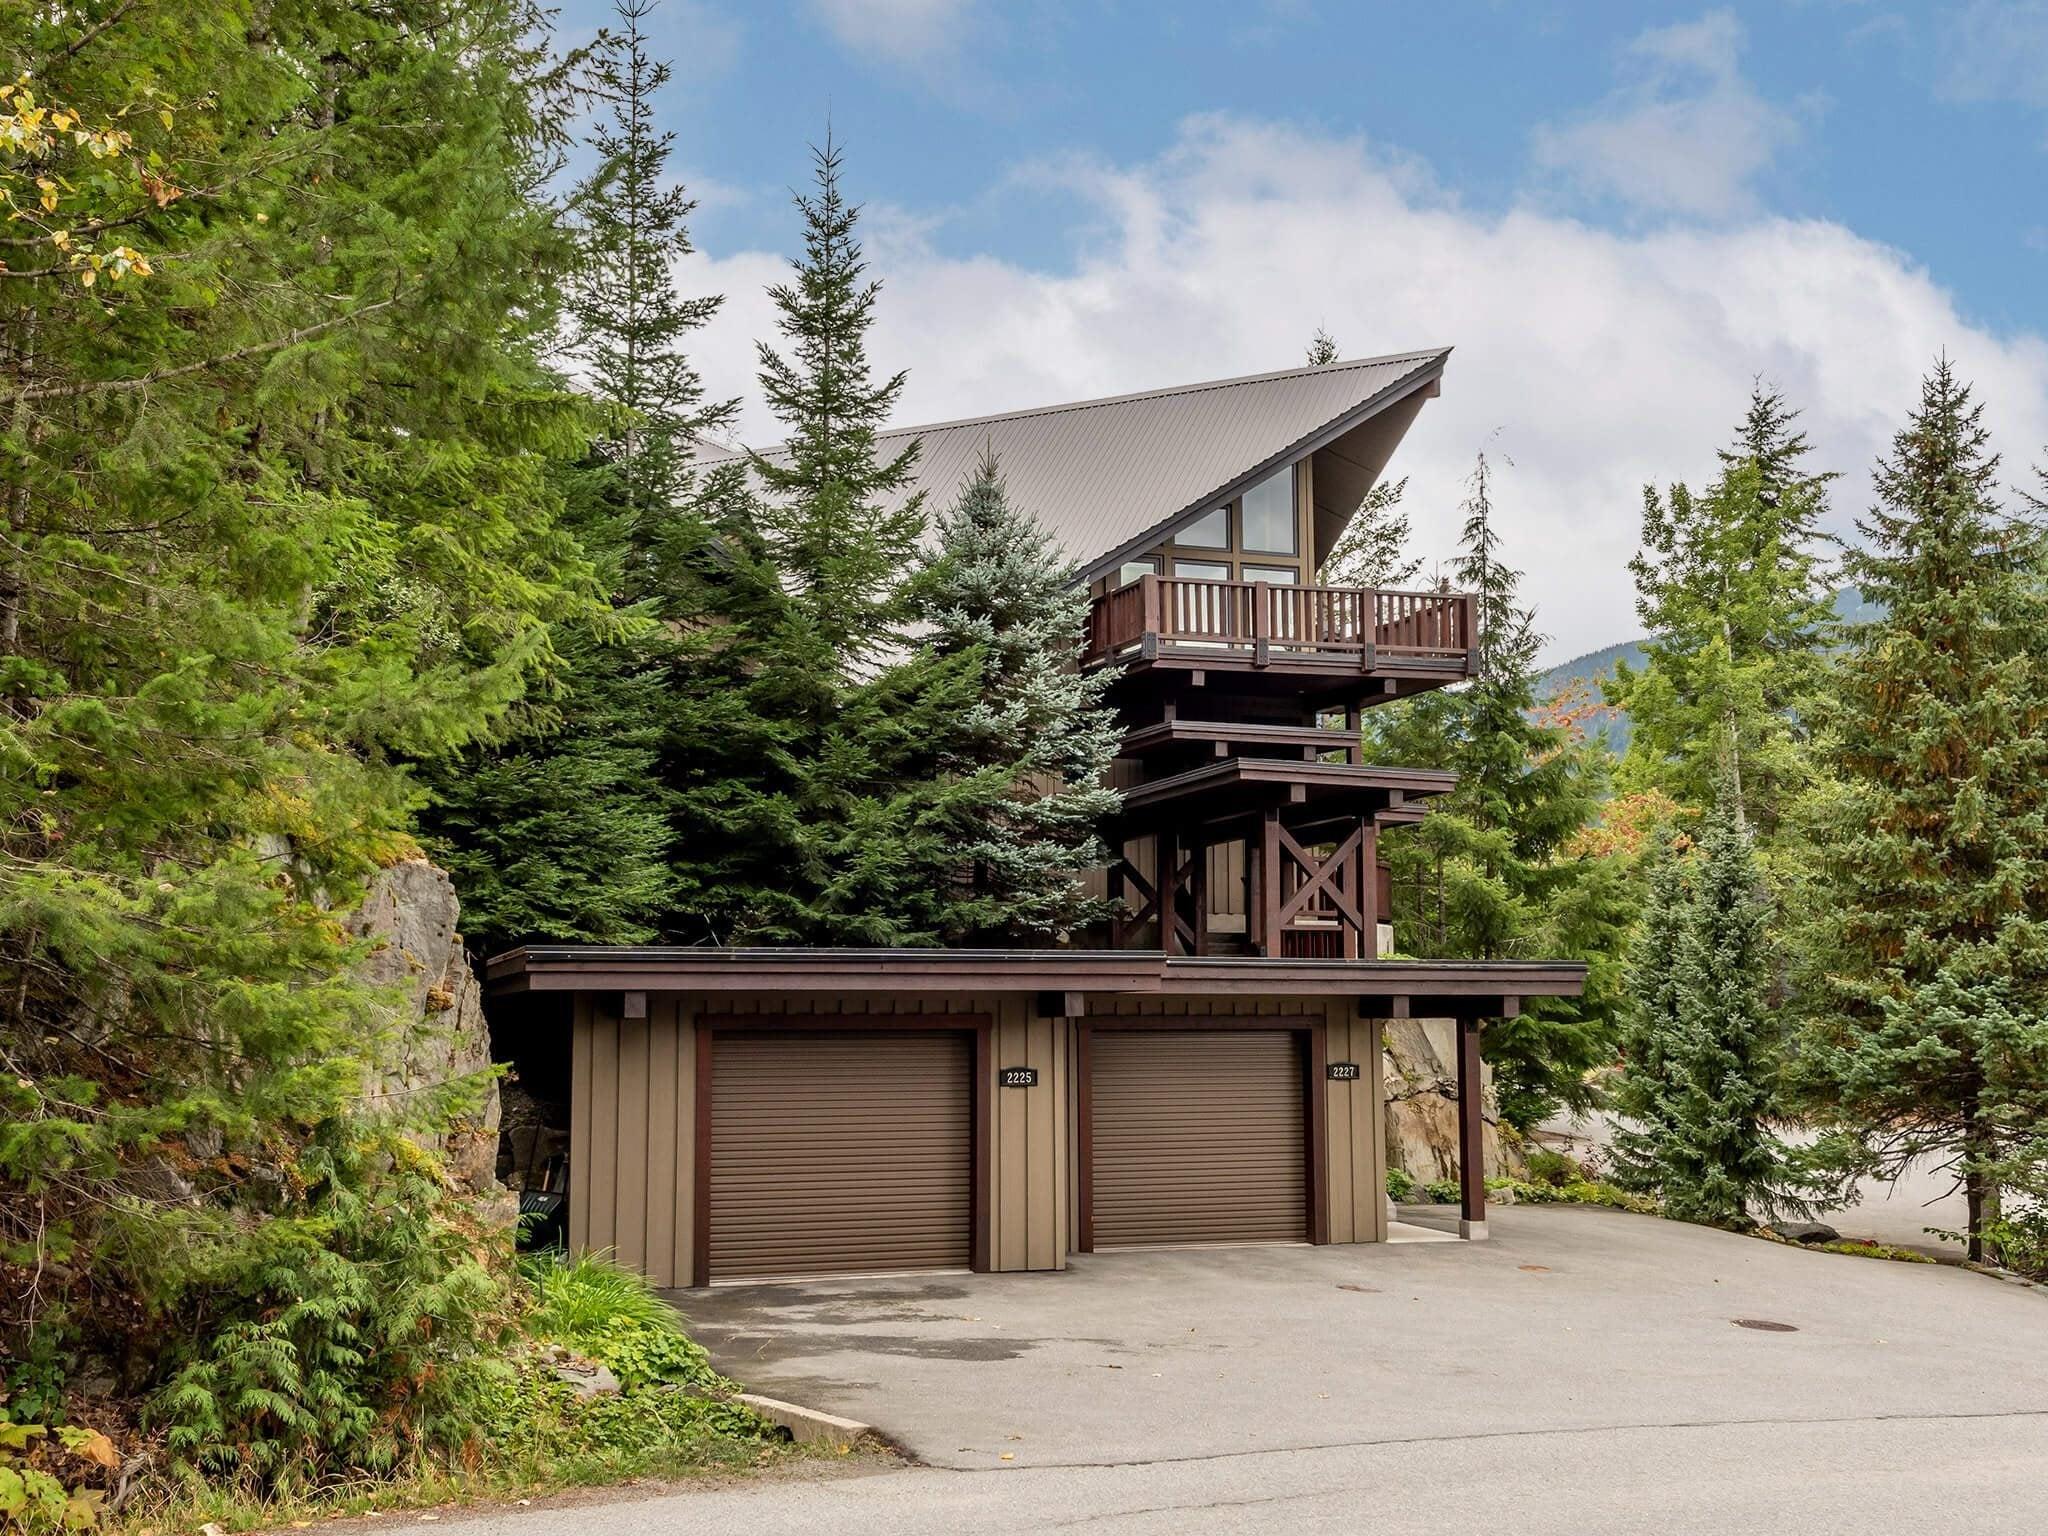 2227 GONDOLA WAY - Whistler Creek 1/2 Duplex for sale, 3 Bedrooms (R2618204)